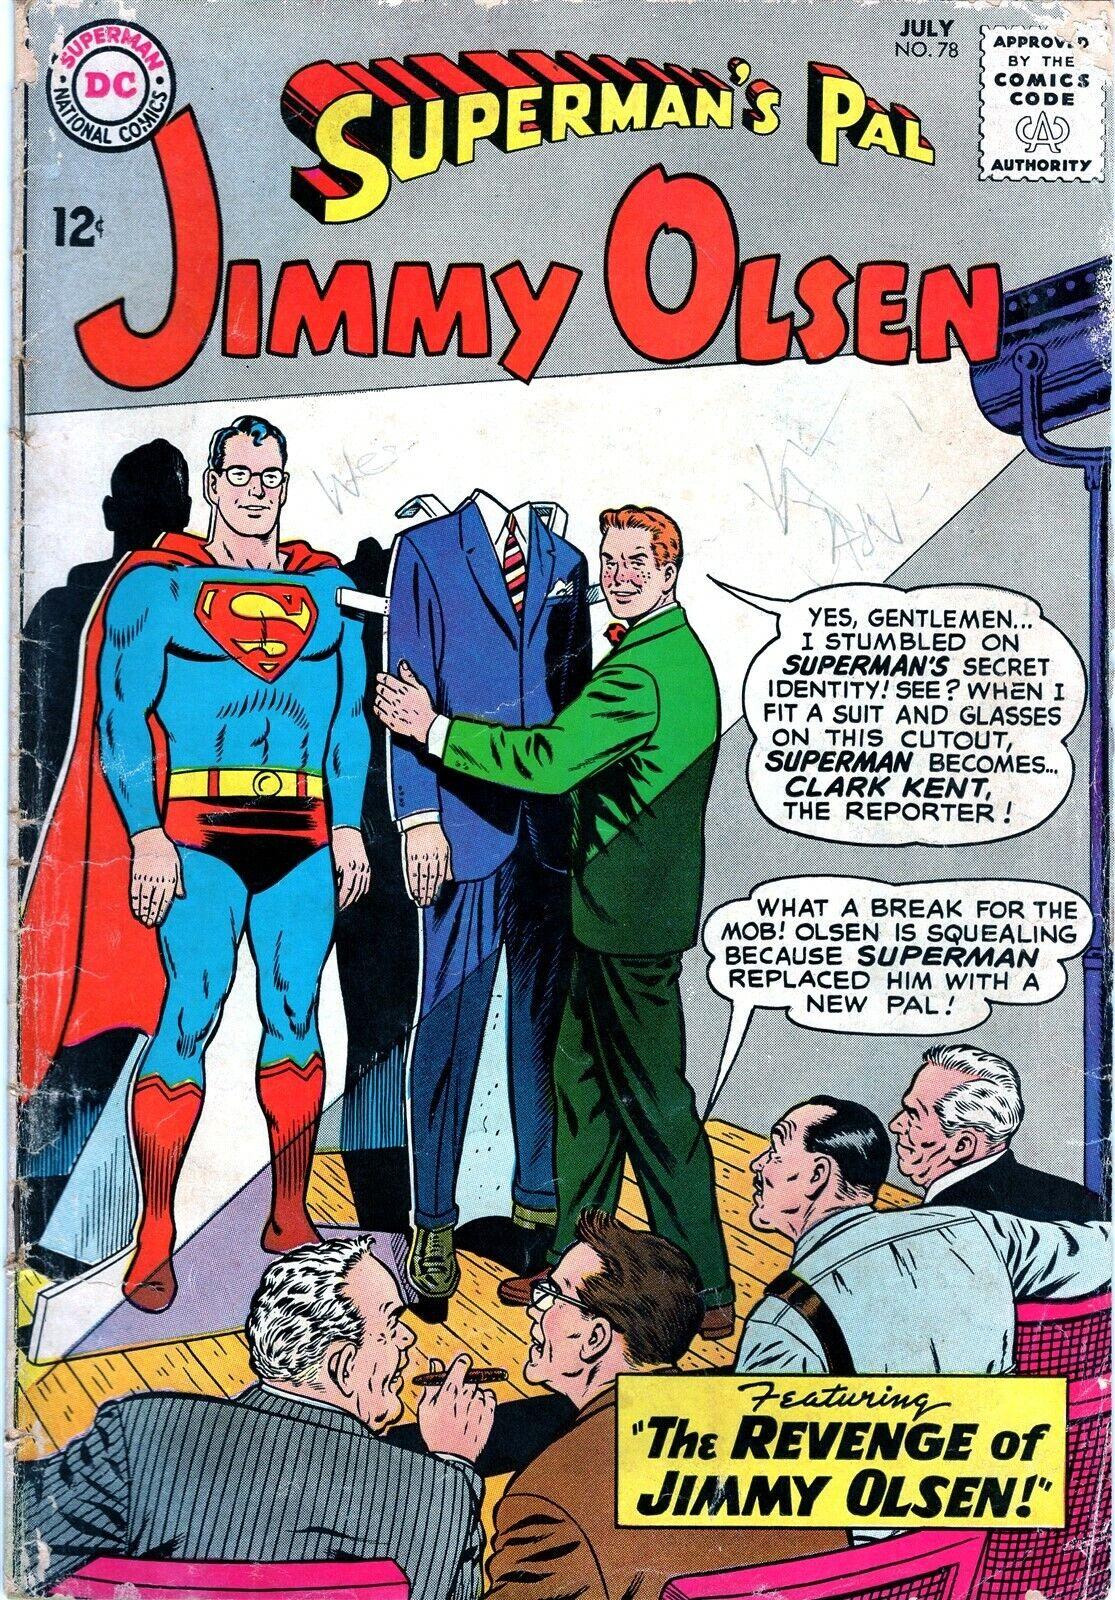 Superman s Pal Jimmy Olsen 78 Curt Swan Silver Age DC Comics 1964  - $0.99